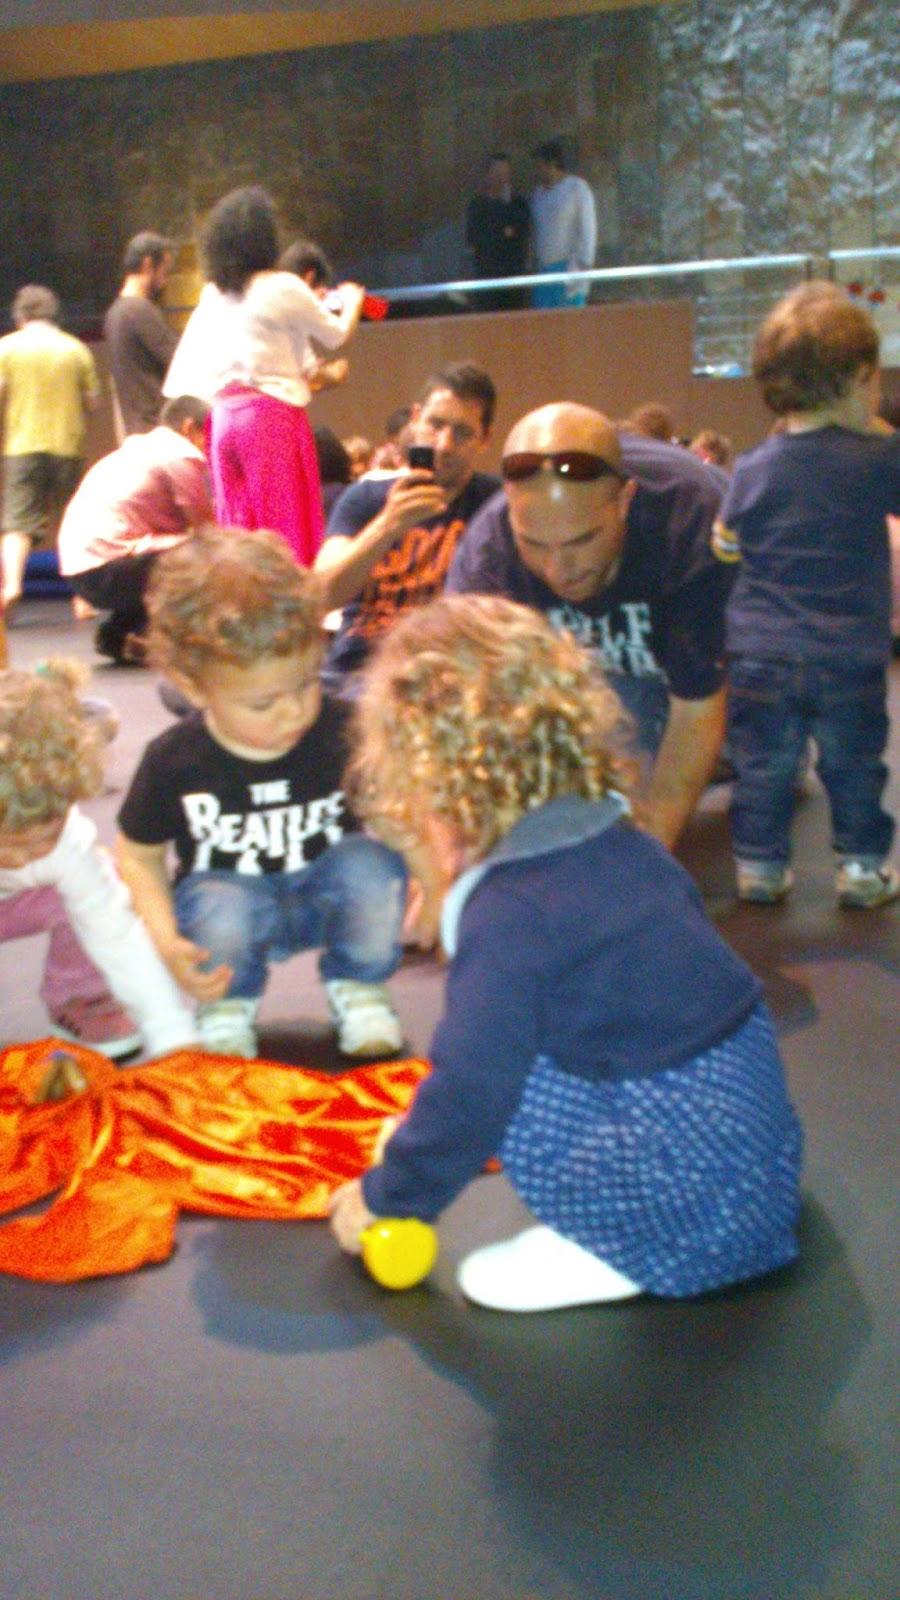 espectacle infantil Palau de la música de Barcelona